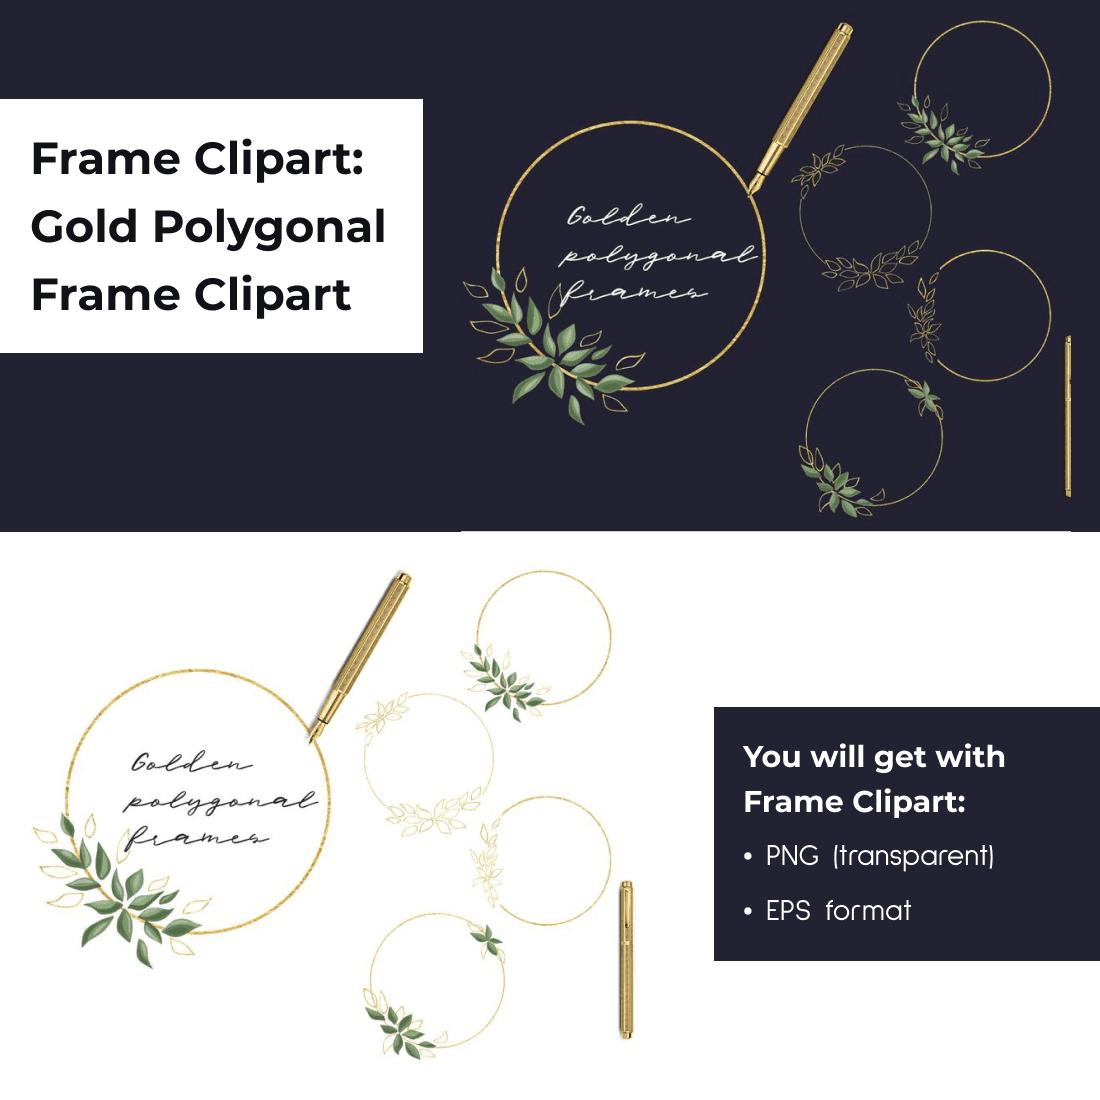 Frame Clipart_ Gold Polygonal Frame Clipart